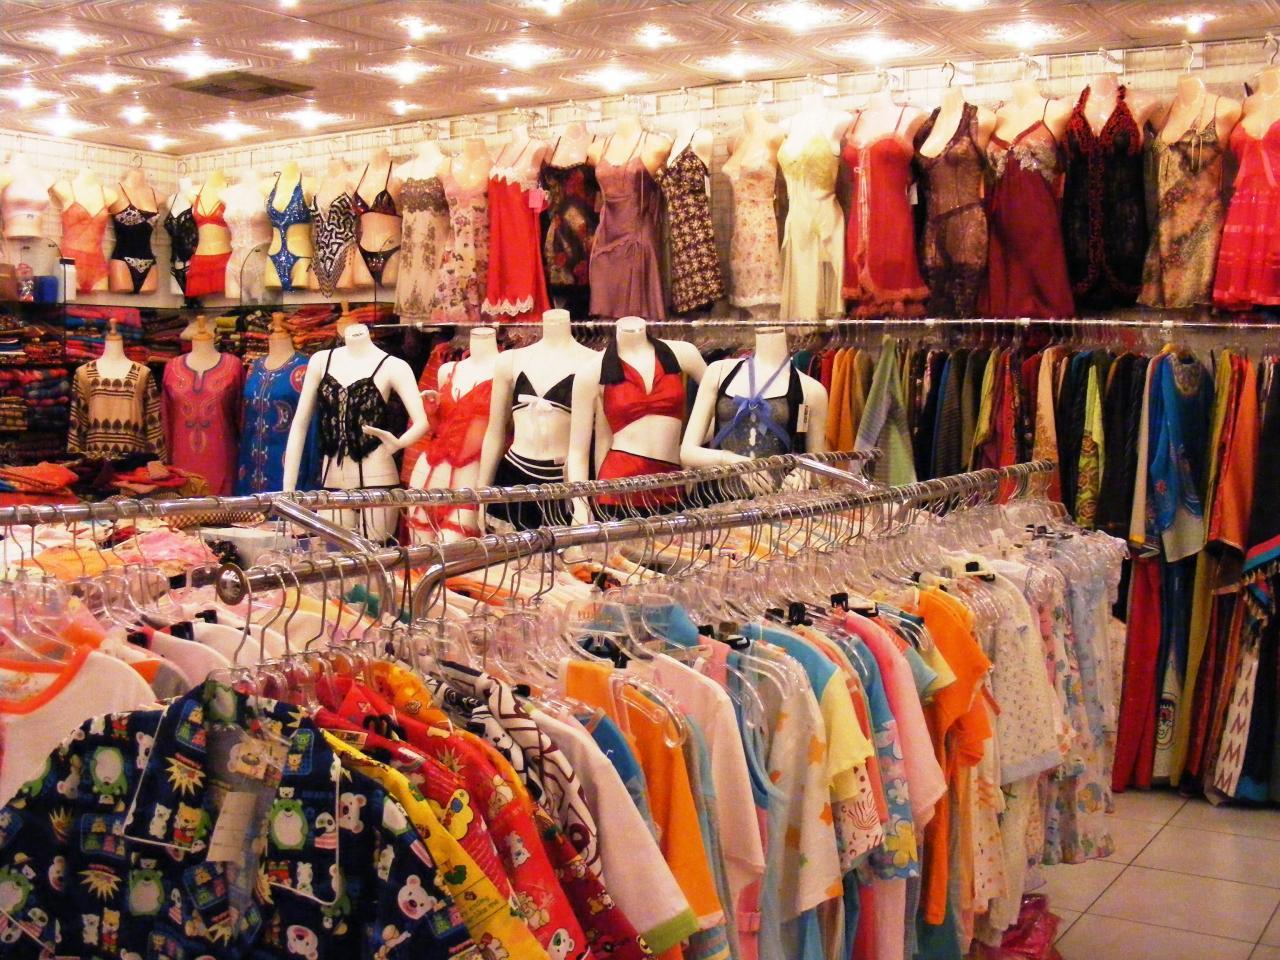 9cf4fc883 مشروع محل ملابس نسائية بعد قرار تأنيث المحلات النسائية سيكون ناجح